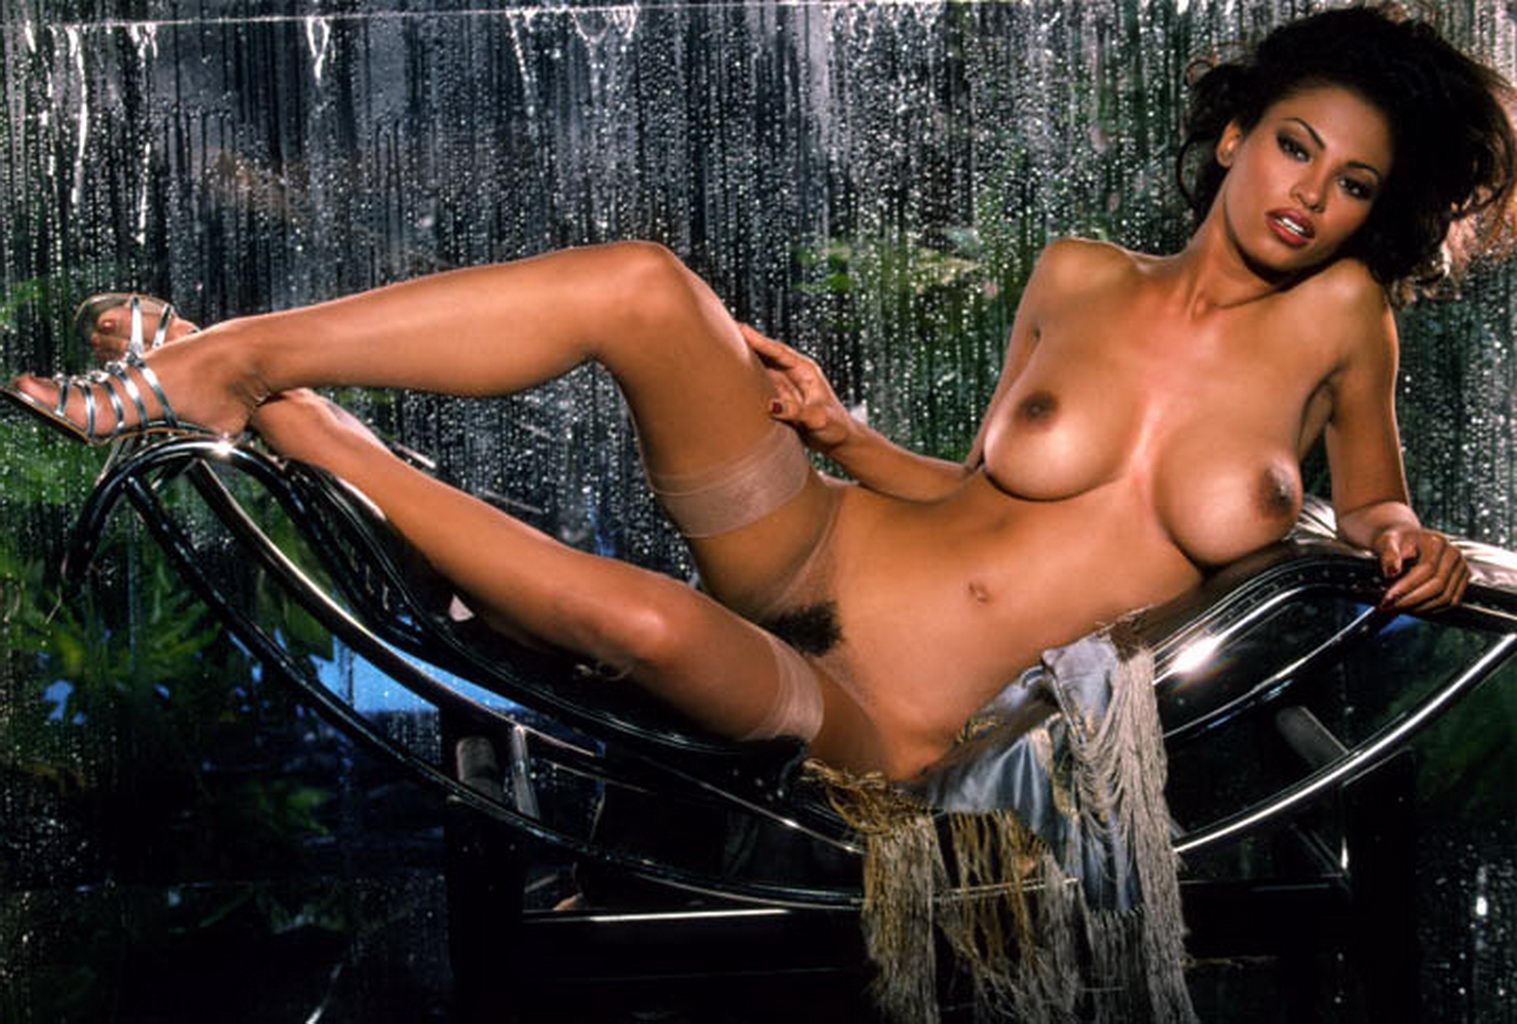 Sexy angelina brill playboy style striptease with bonus orgasm